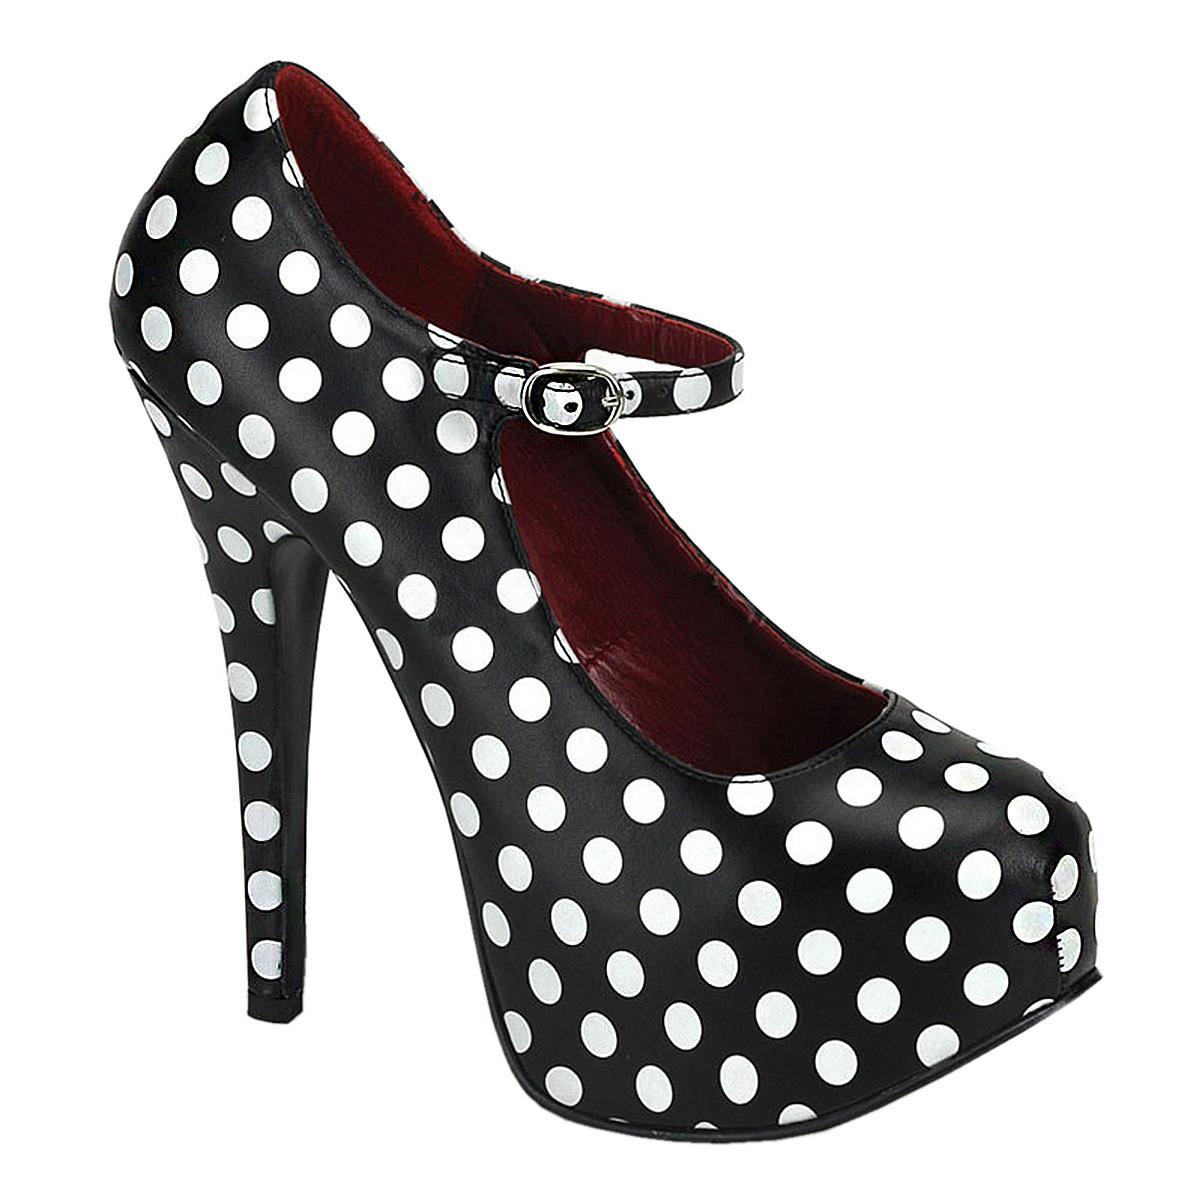 Bordello Womens Polka Dot Mary Jane Pumps Black Red Class...